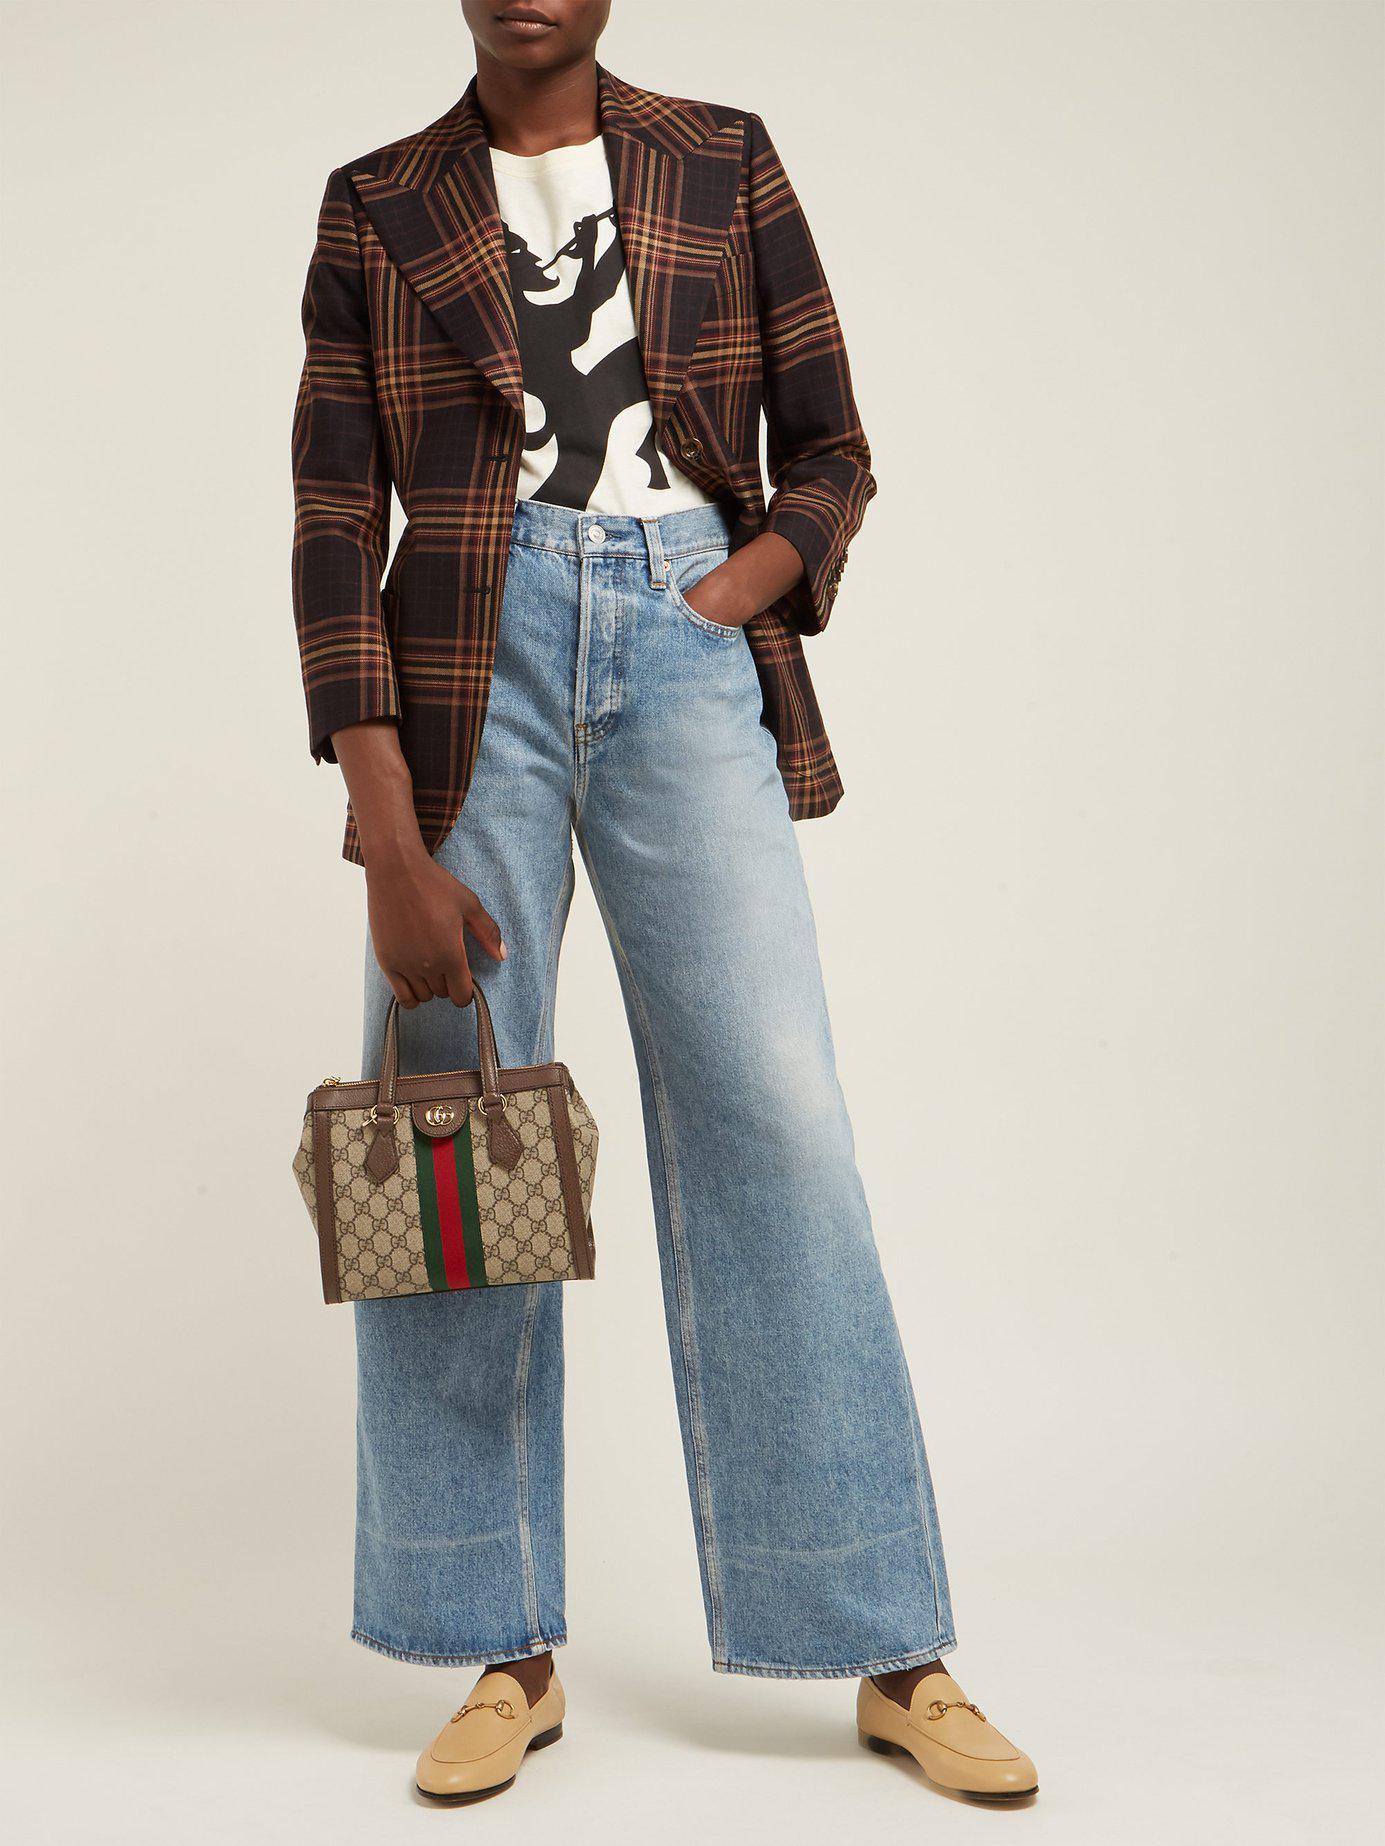 8d3f947e09d Lyst - Gucci Ophidia Gg Supreme Canvas Cross Body Bag in Gray